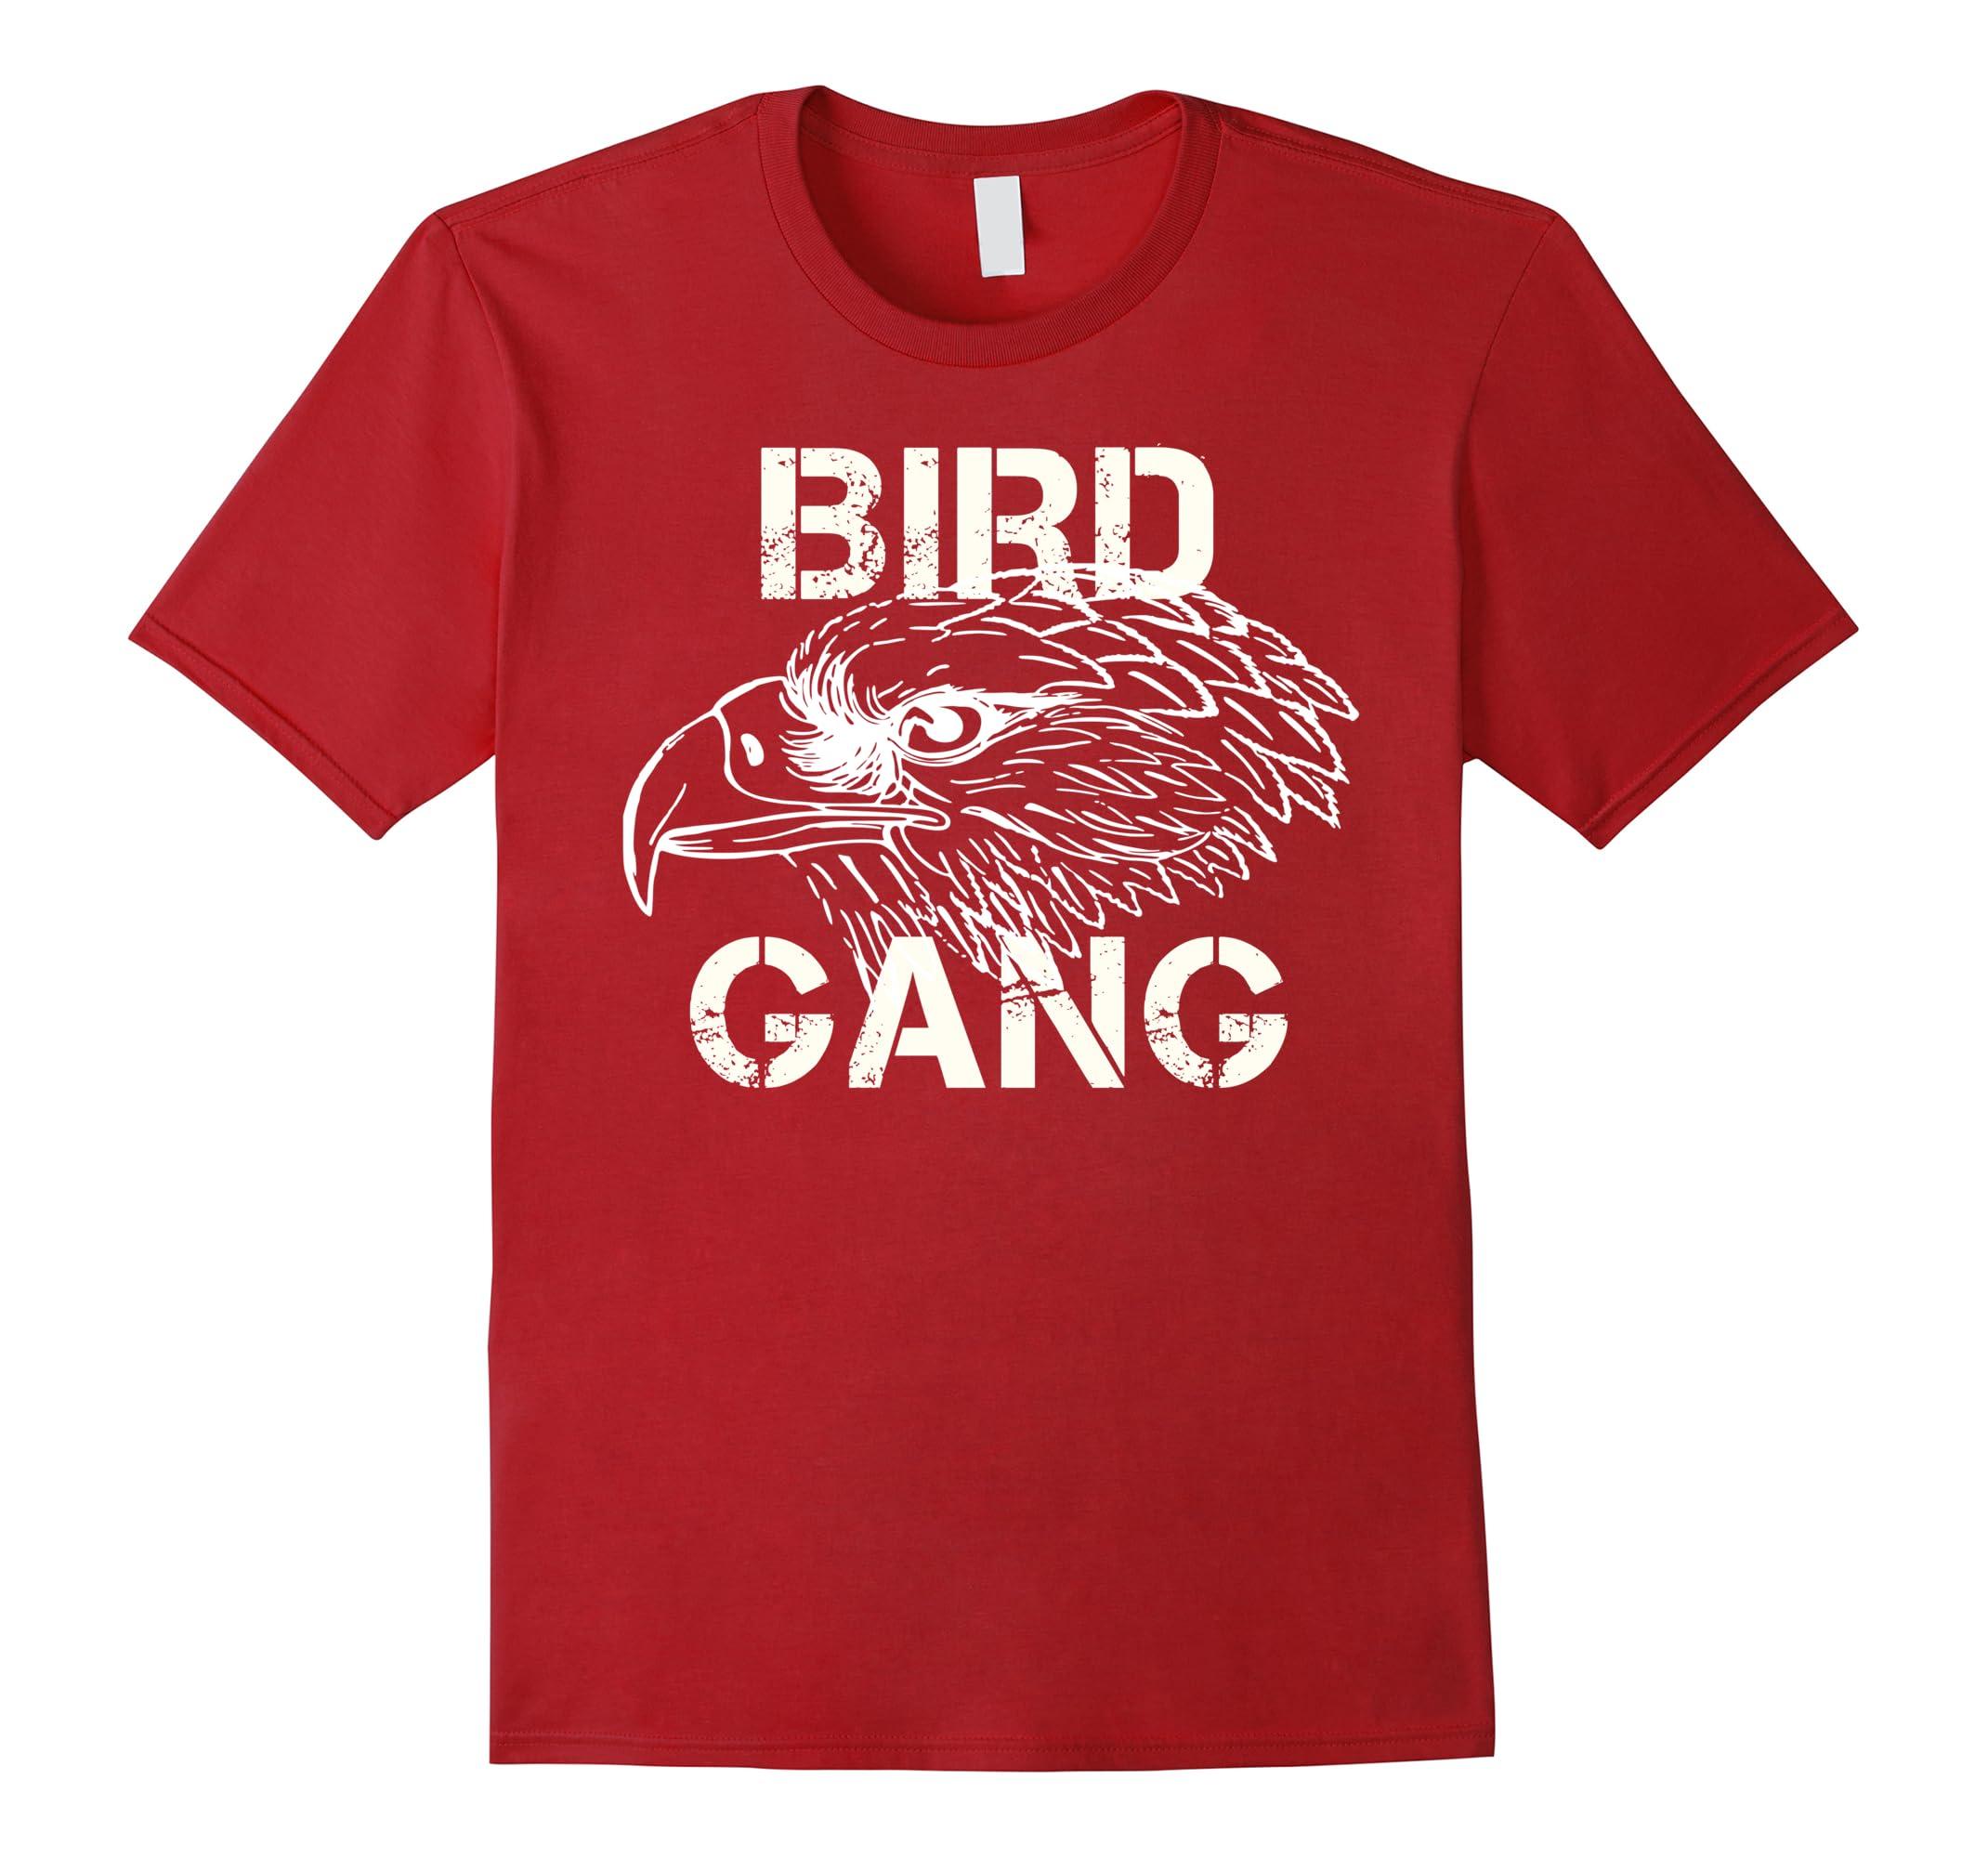 Bird Gang Eagle Tee Shirt Philadelphia Underdogs Shirt-ah my shirt one gift